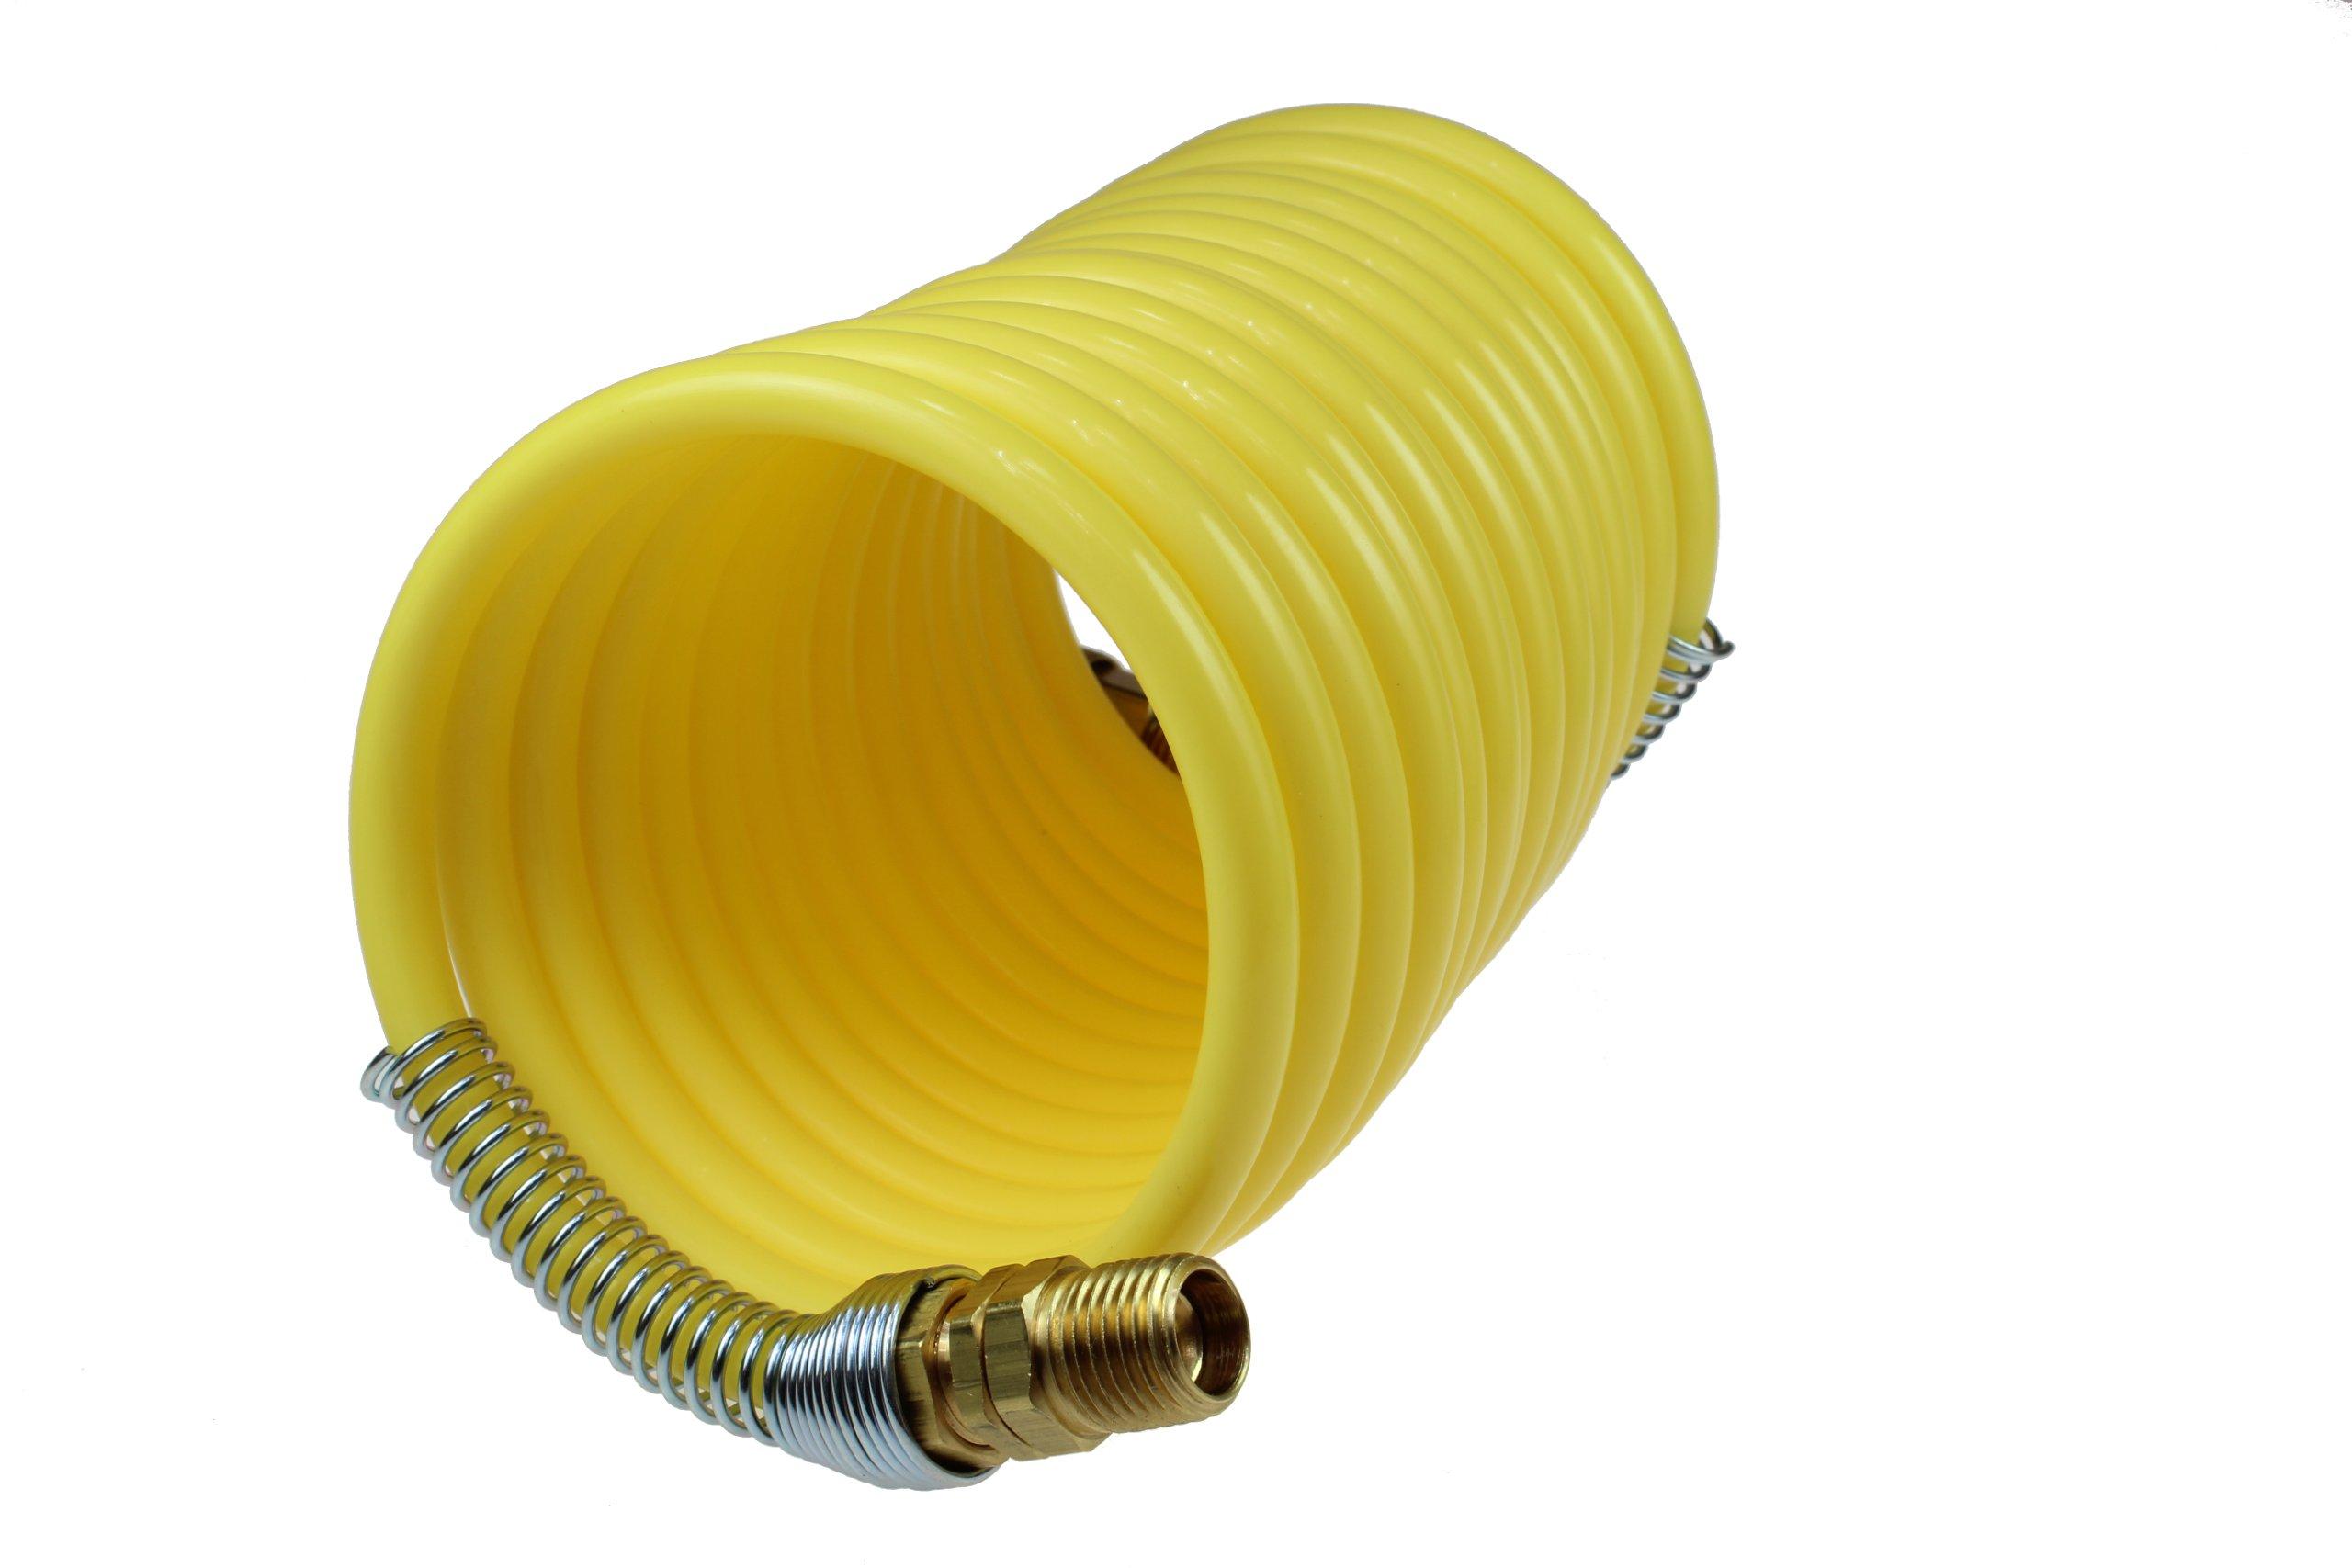 Manguera neumatica : Coilhose 170 psi N12-50B 1/2 x 15 mt